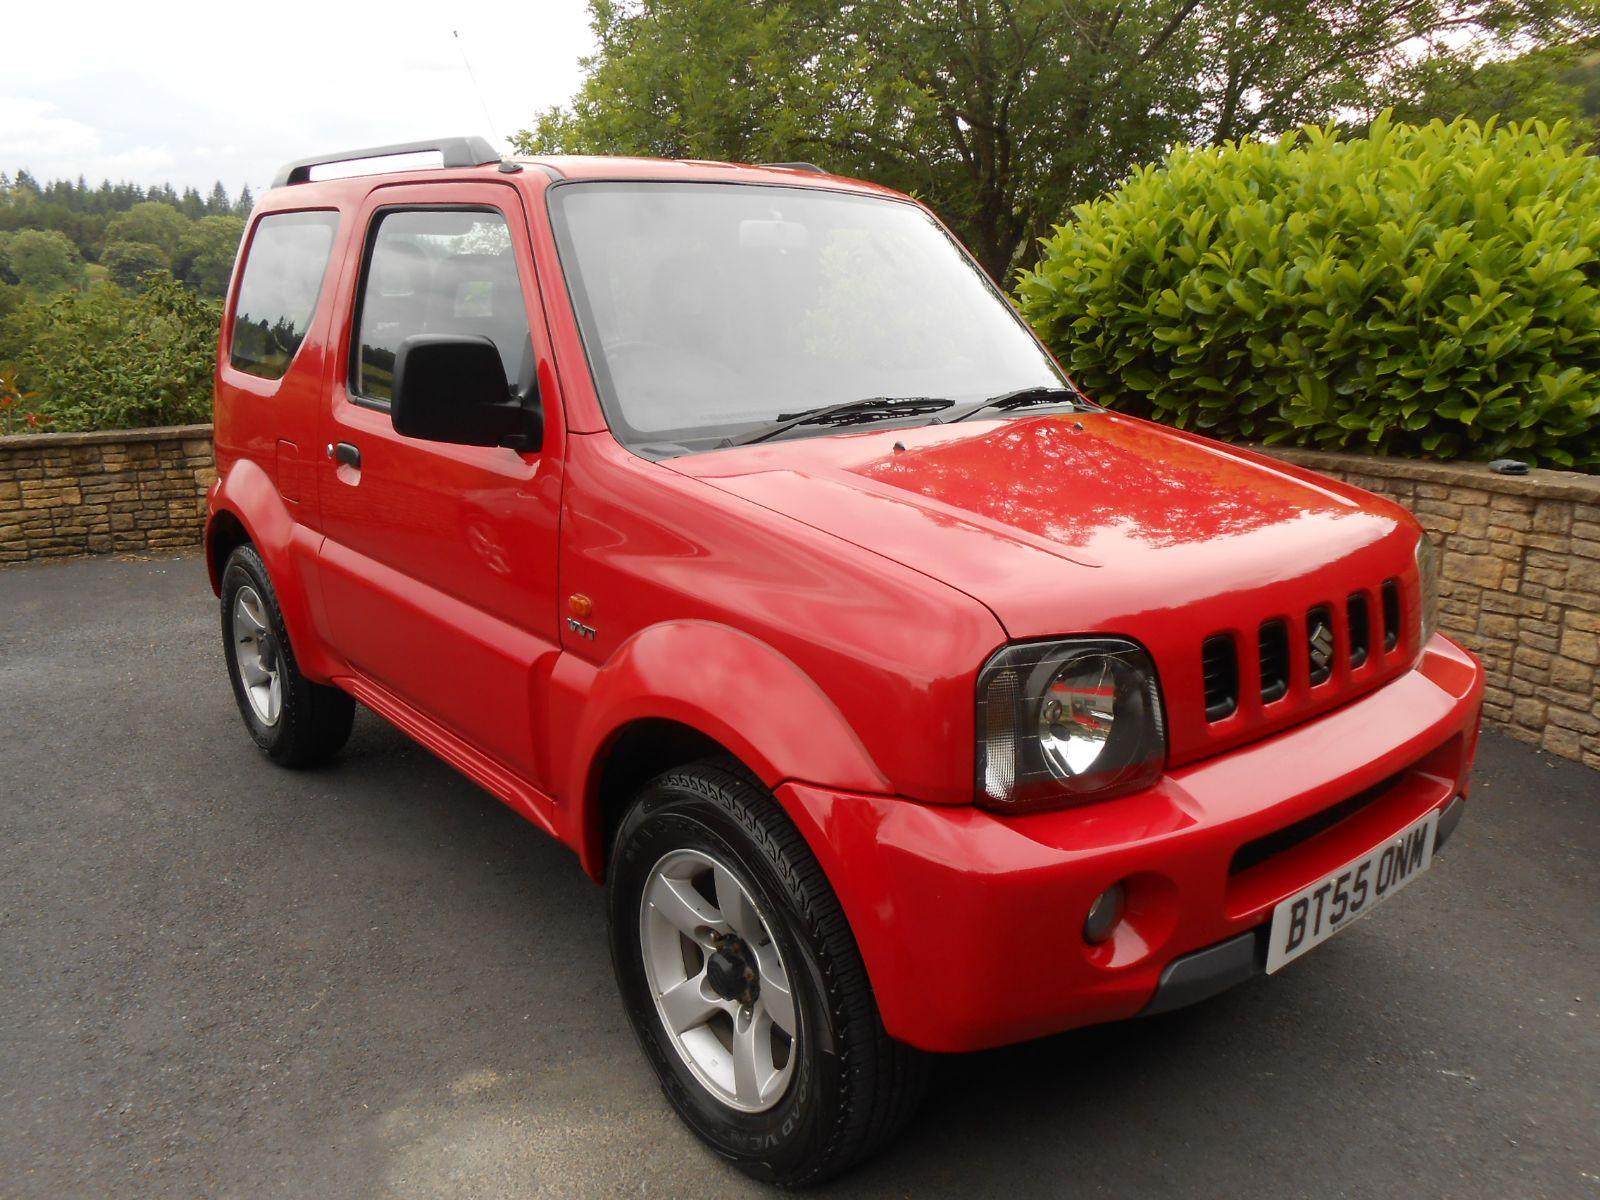 Suzuki Jimny 1.3 VVTS 4WD Car For Sale Llanidloes Powys